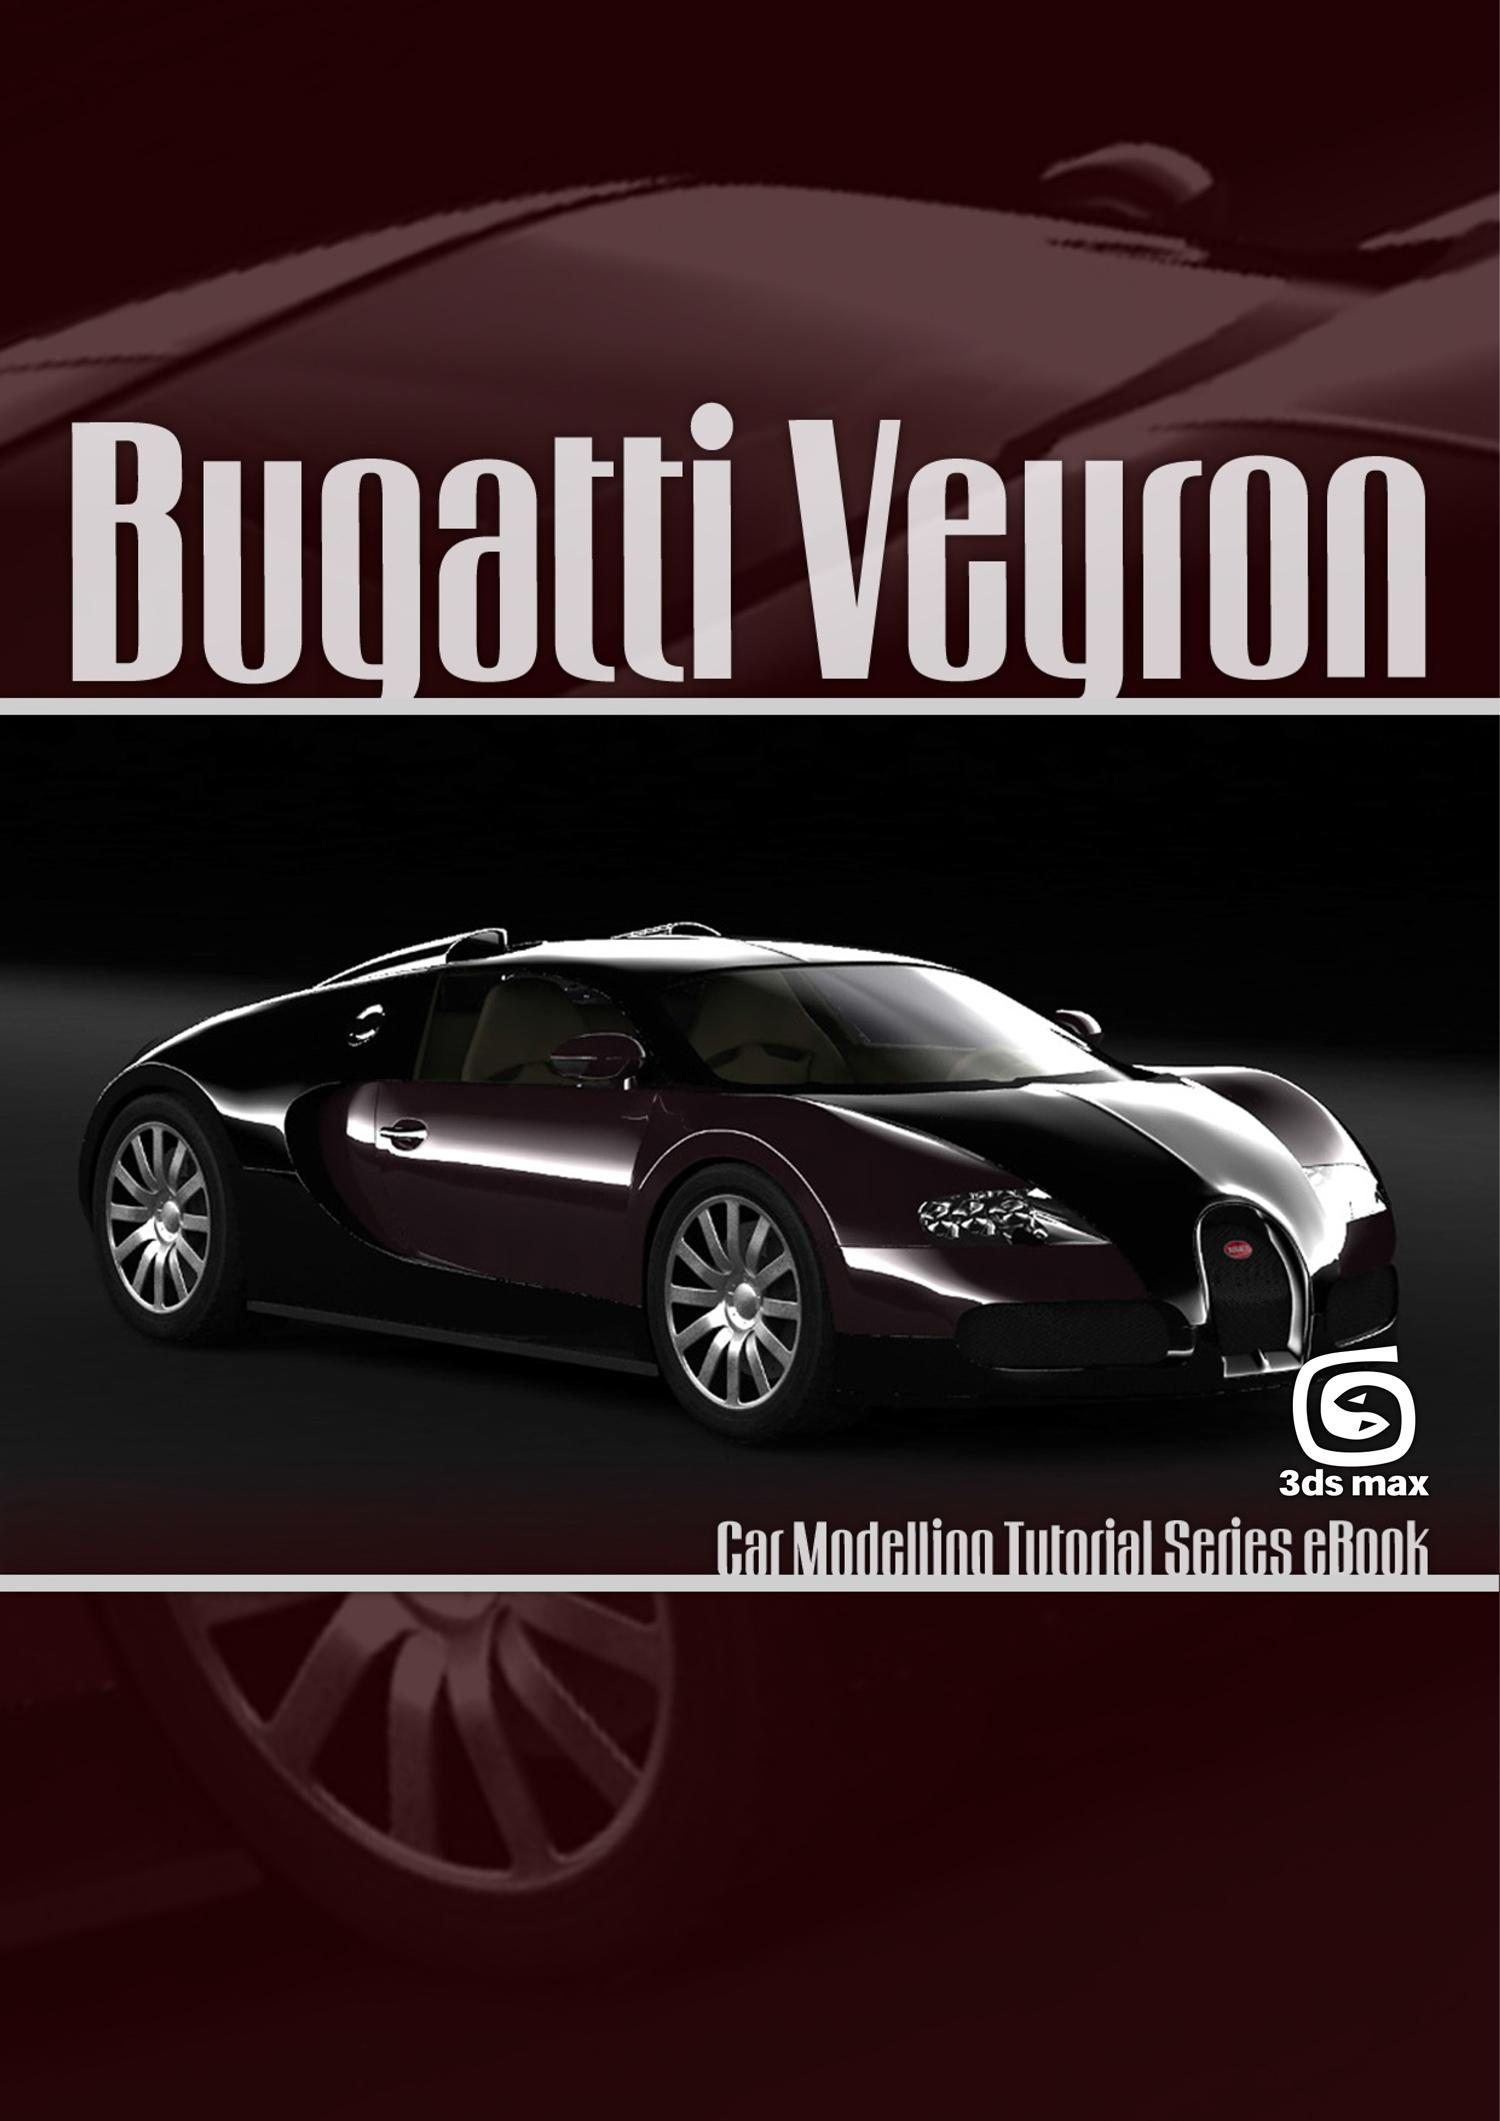 Bugatti veyron 3dsmax download only bugatti veyron 3dsmax download only malvernweather Images